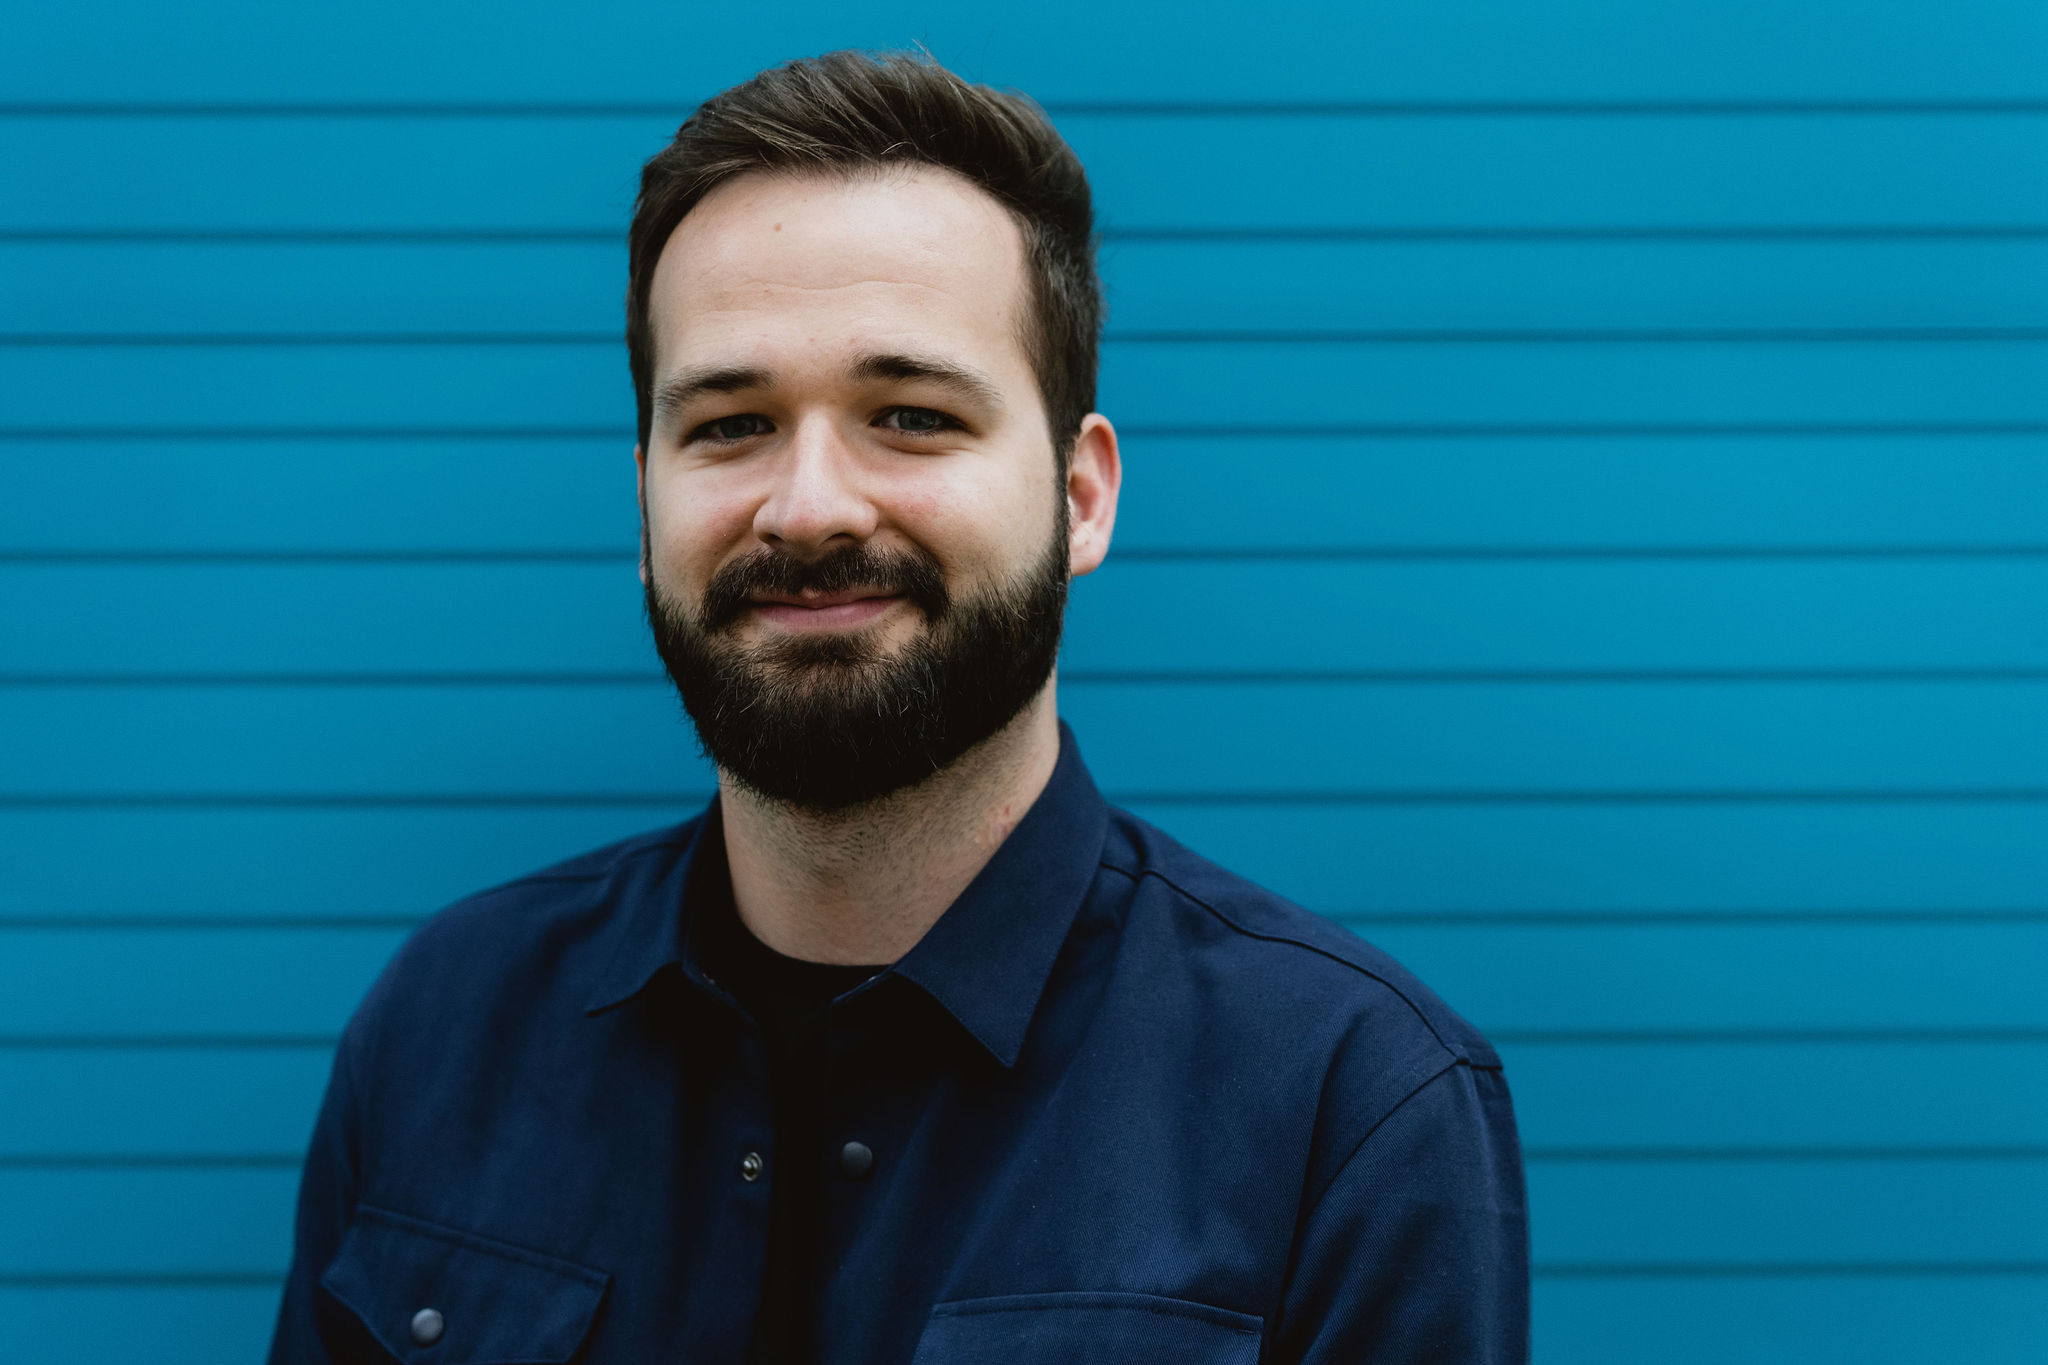 Filip Kniola - Digital Marketing Manager